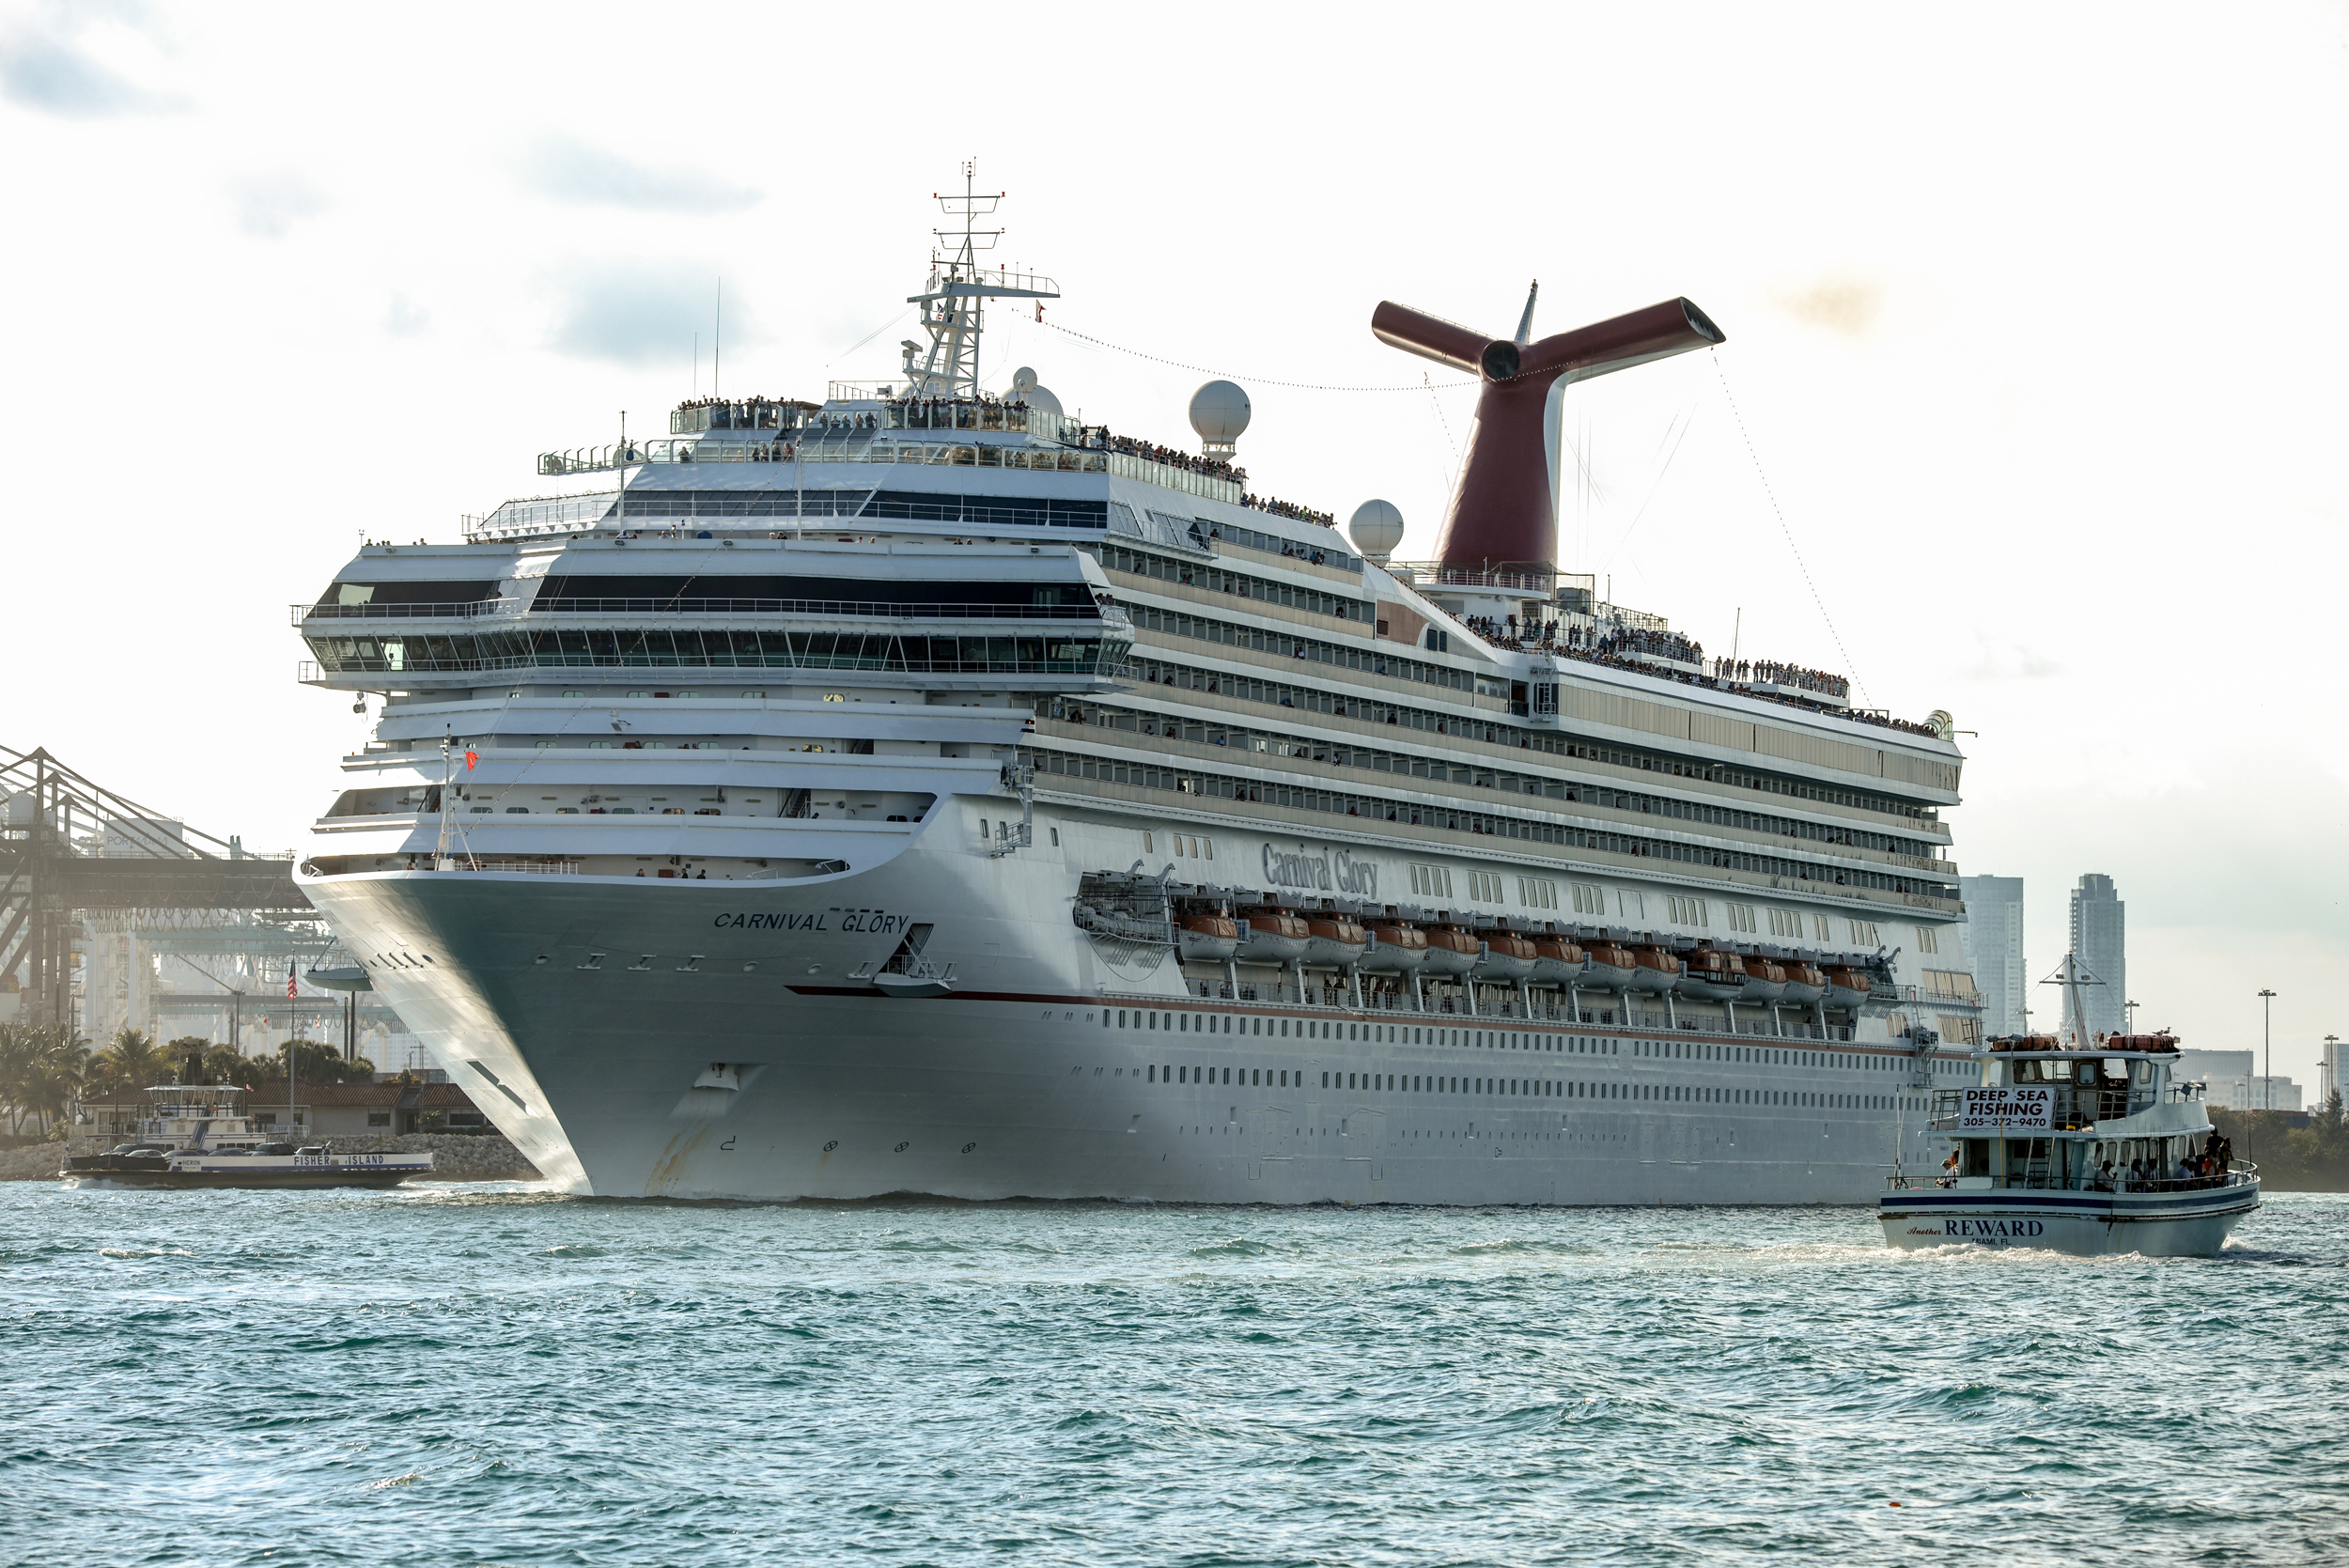 Carnival docks ship in New Orleans as emergency housing for Ida response crews